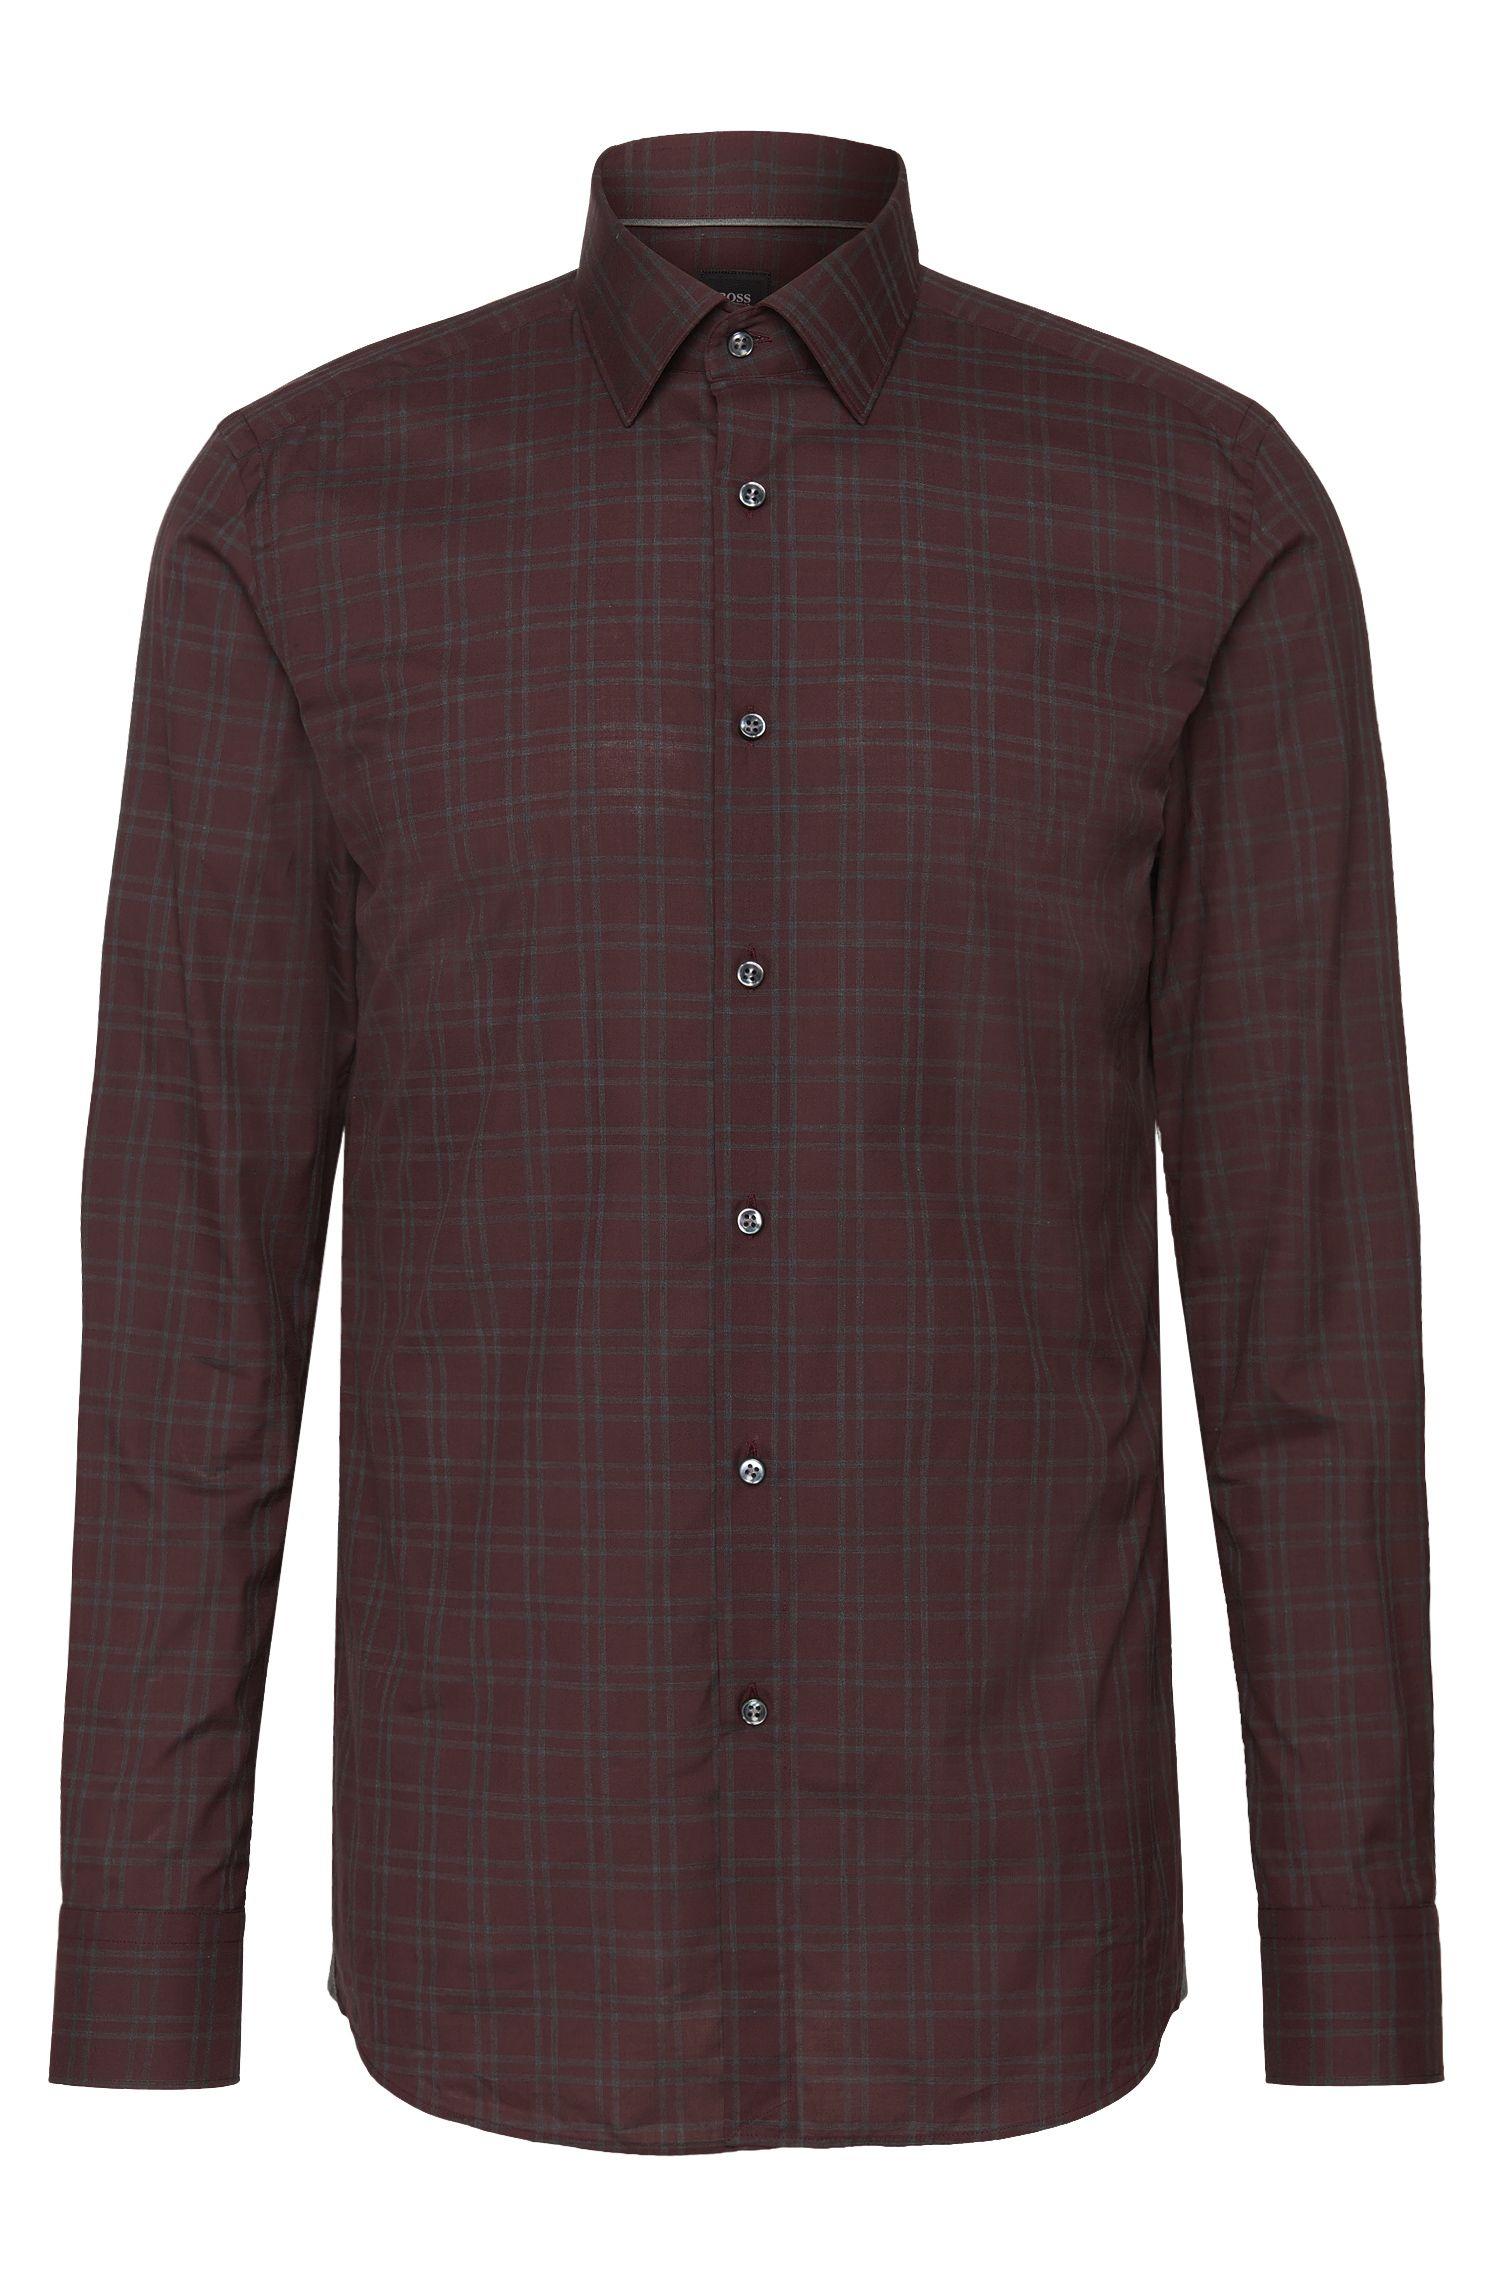 'T-Scott' | Slim Fit, Italian Cotton Checked Dress Shirt